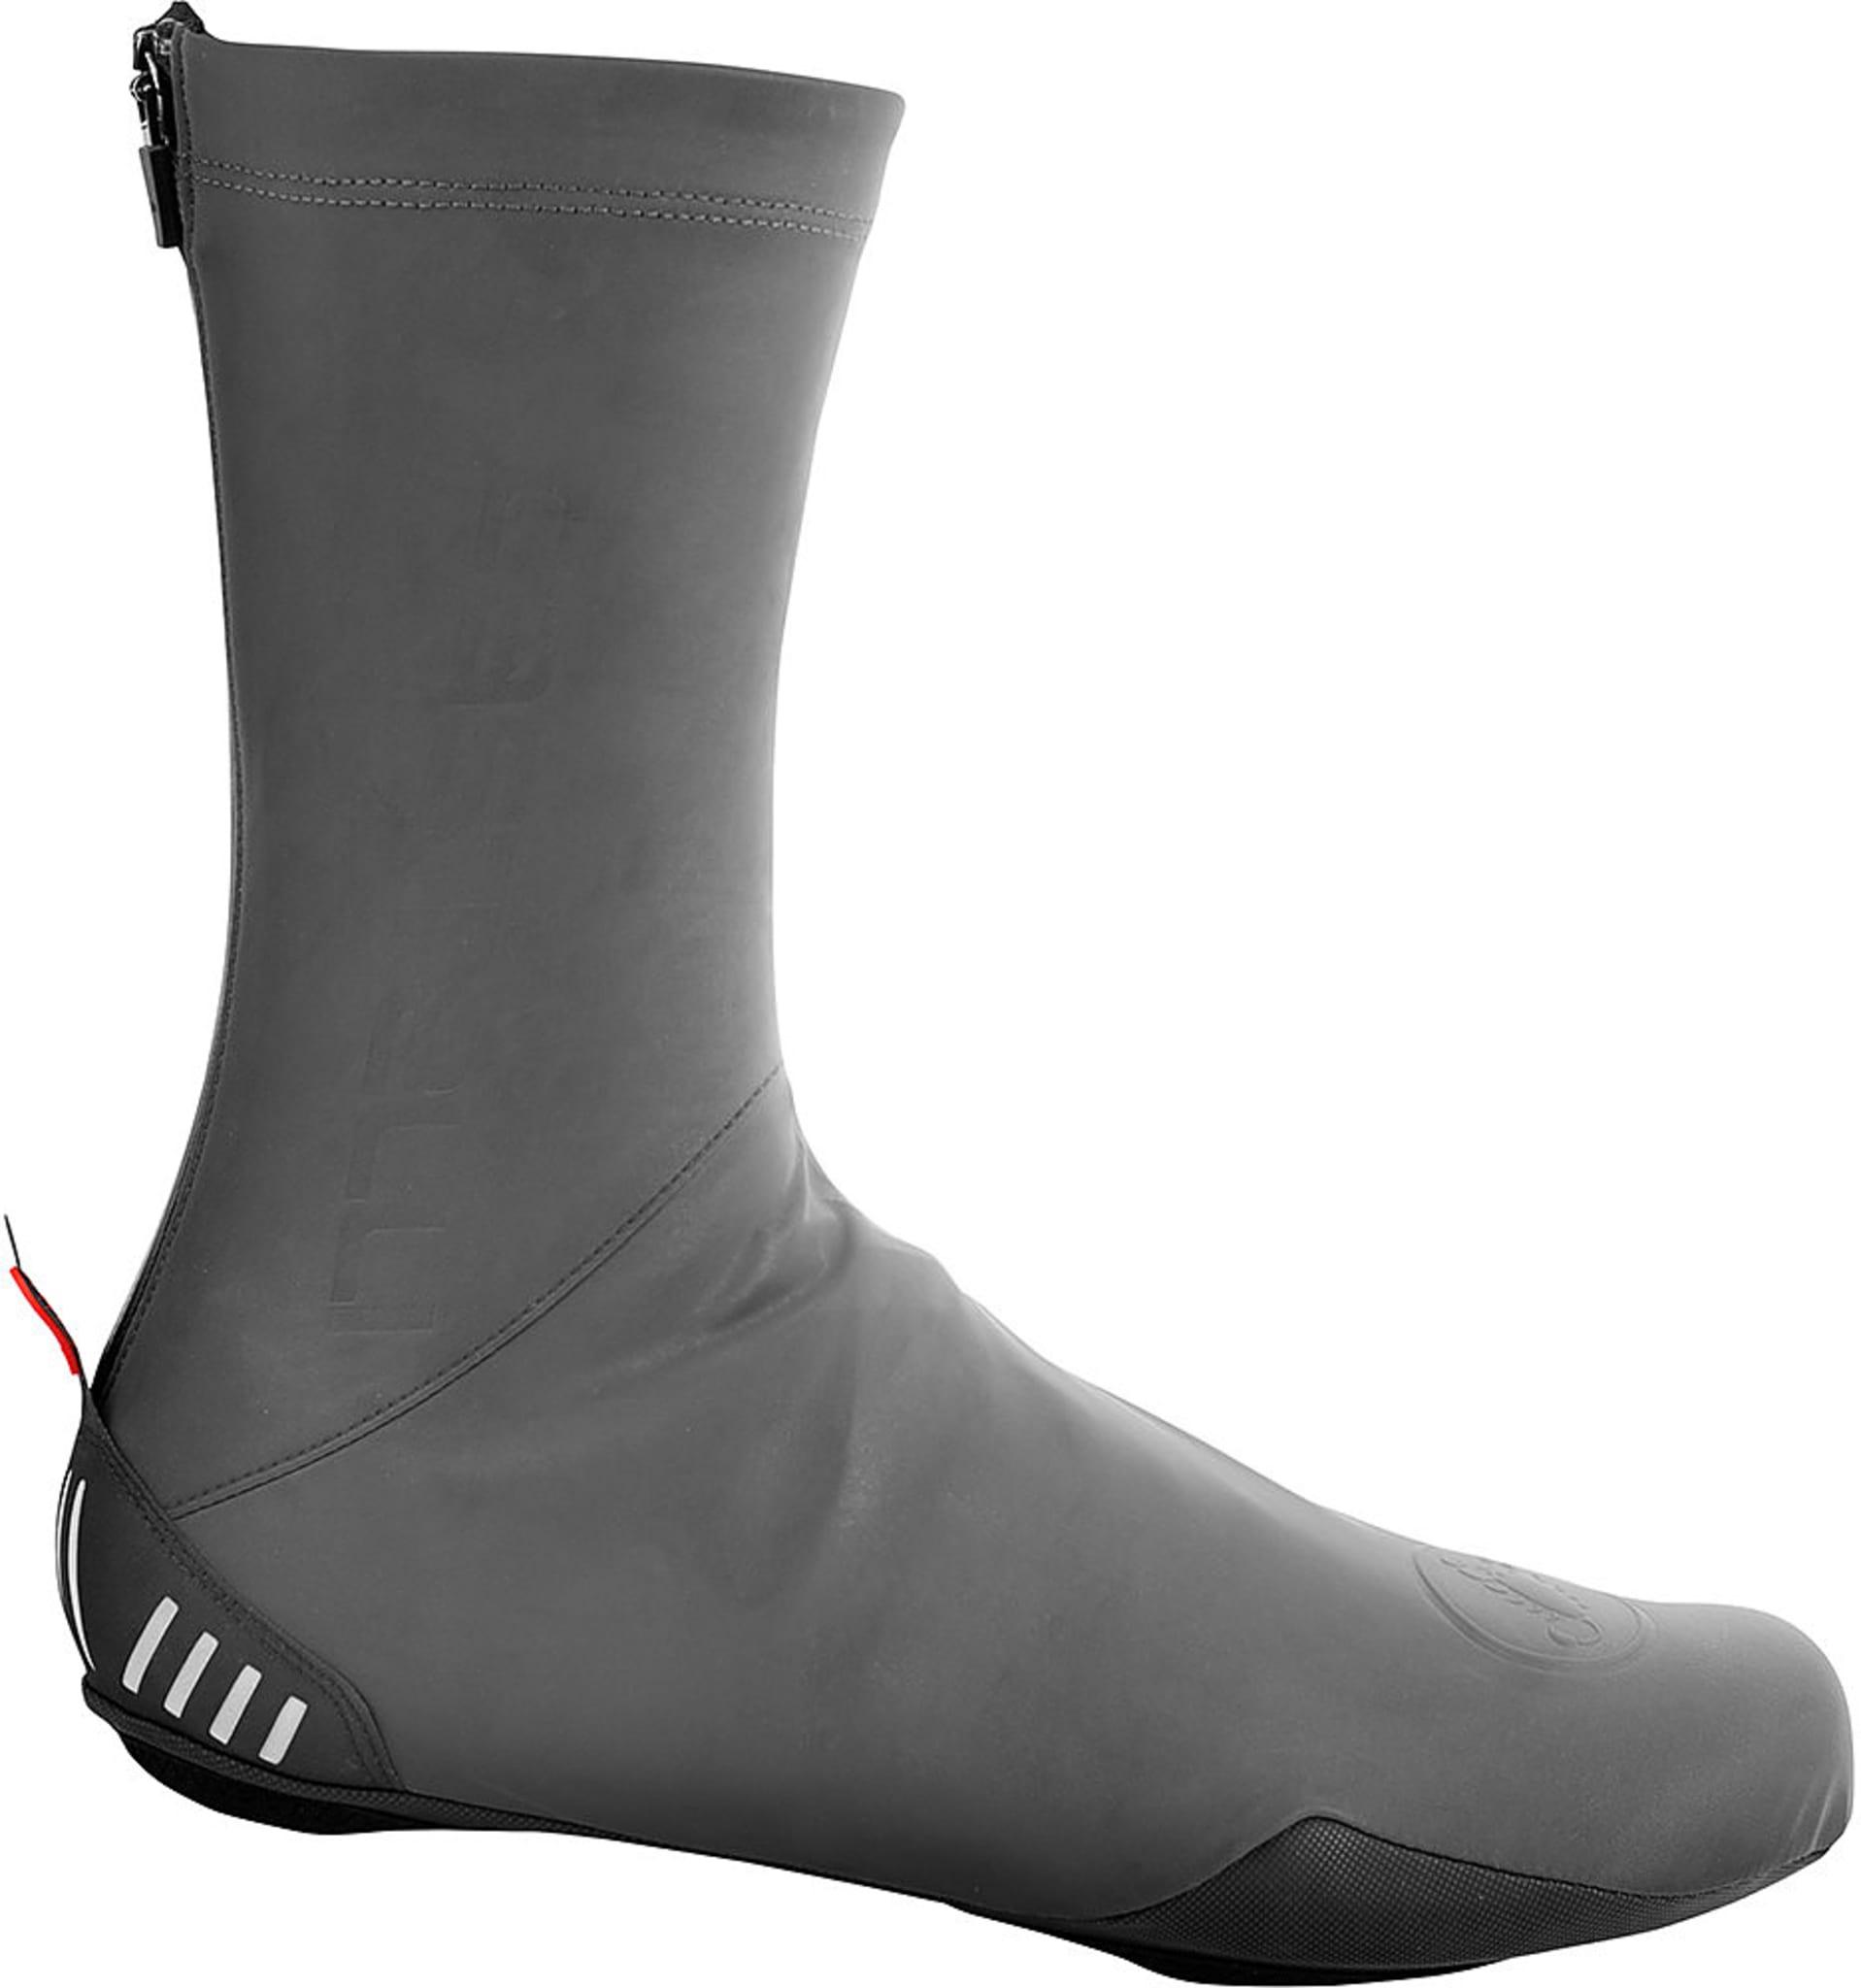 Reflex Shoecover